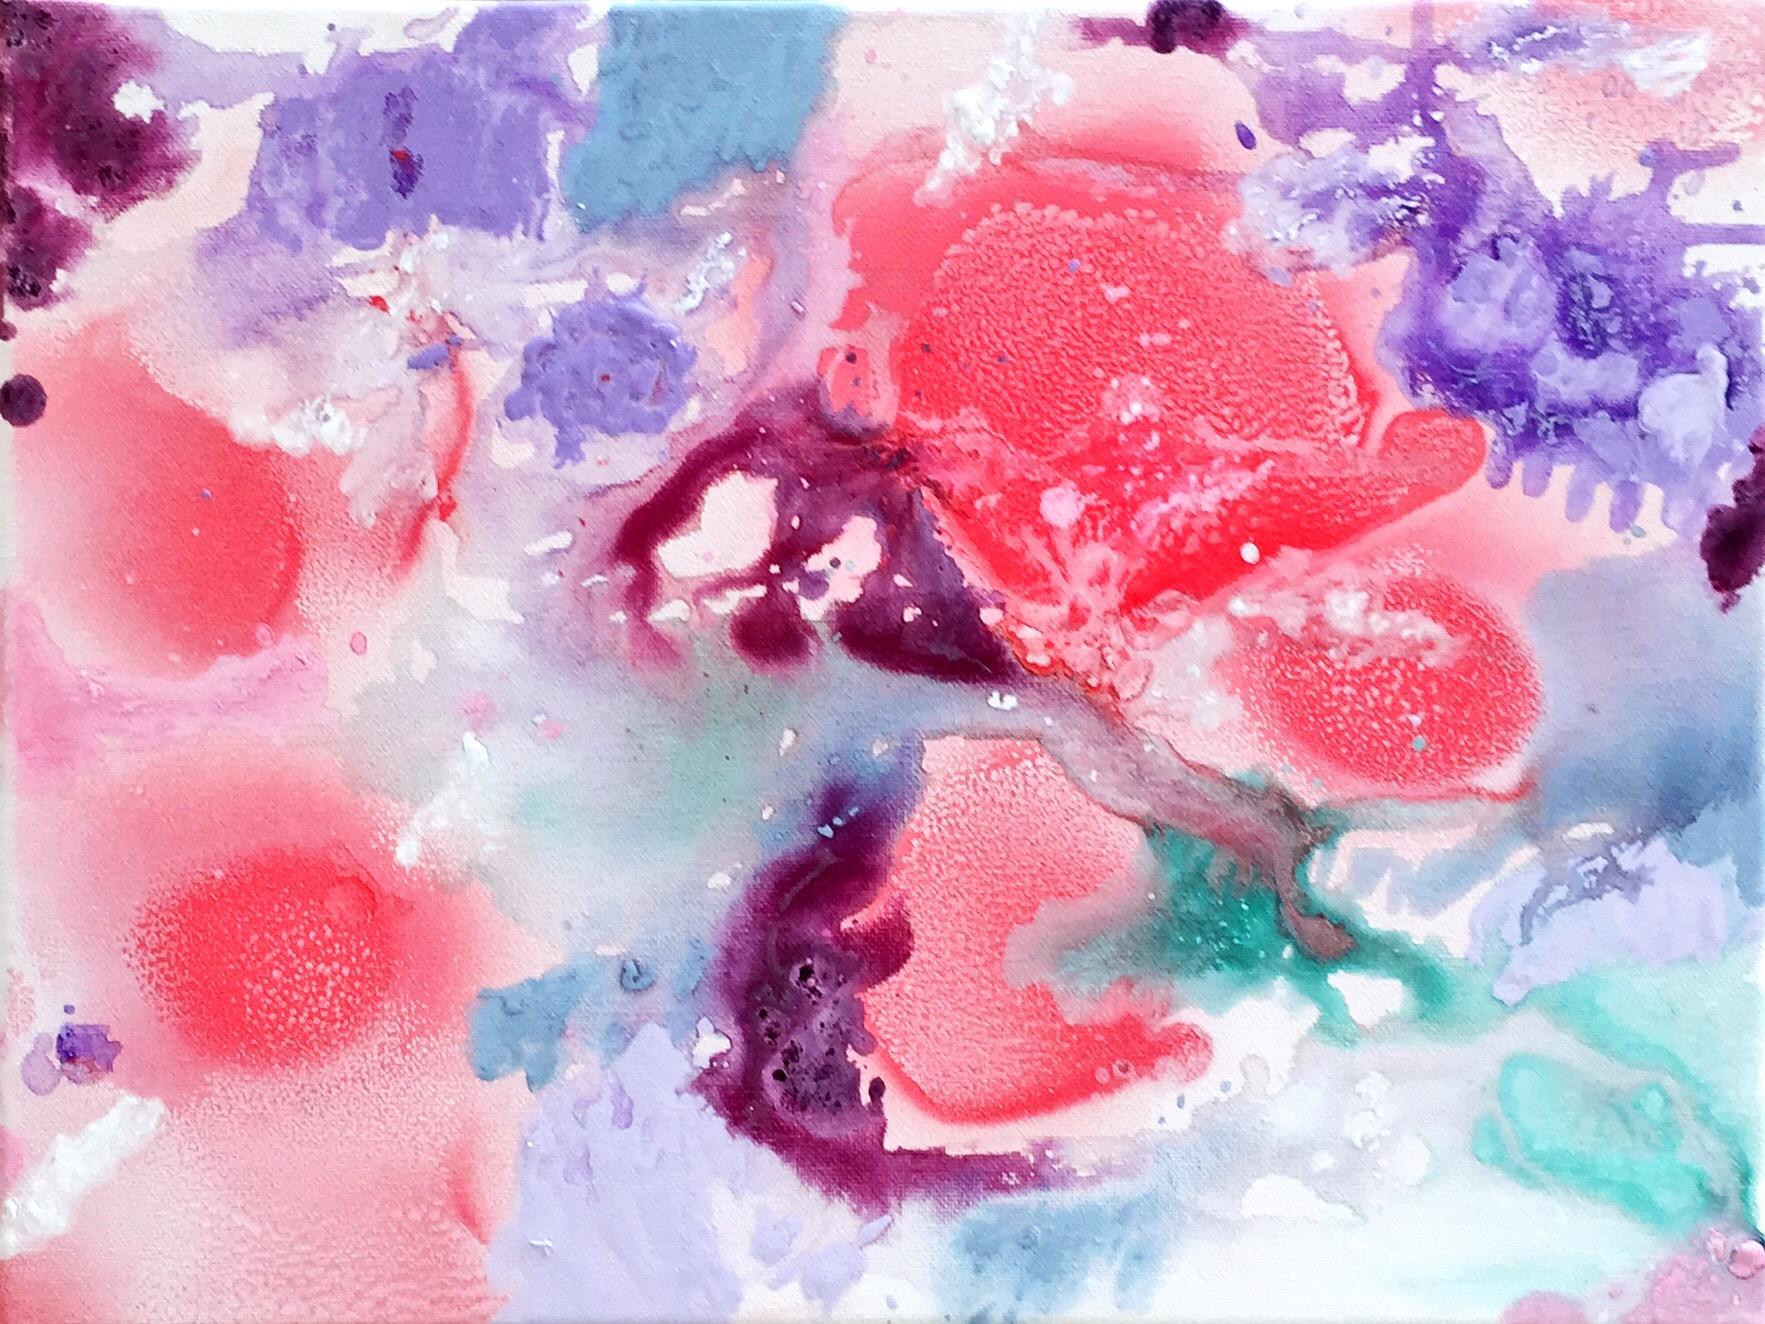 Bild Malerei Kunstwerk SoulArtist Julia Merkt Blumenmeer